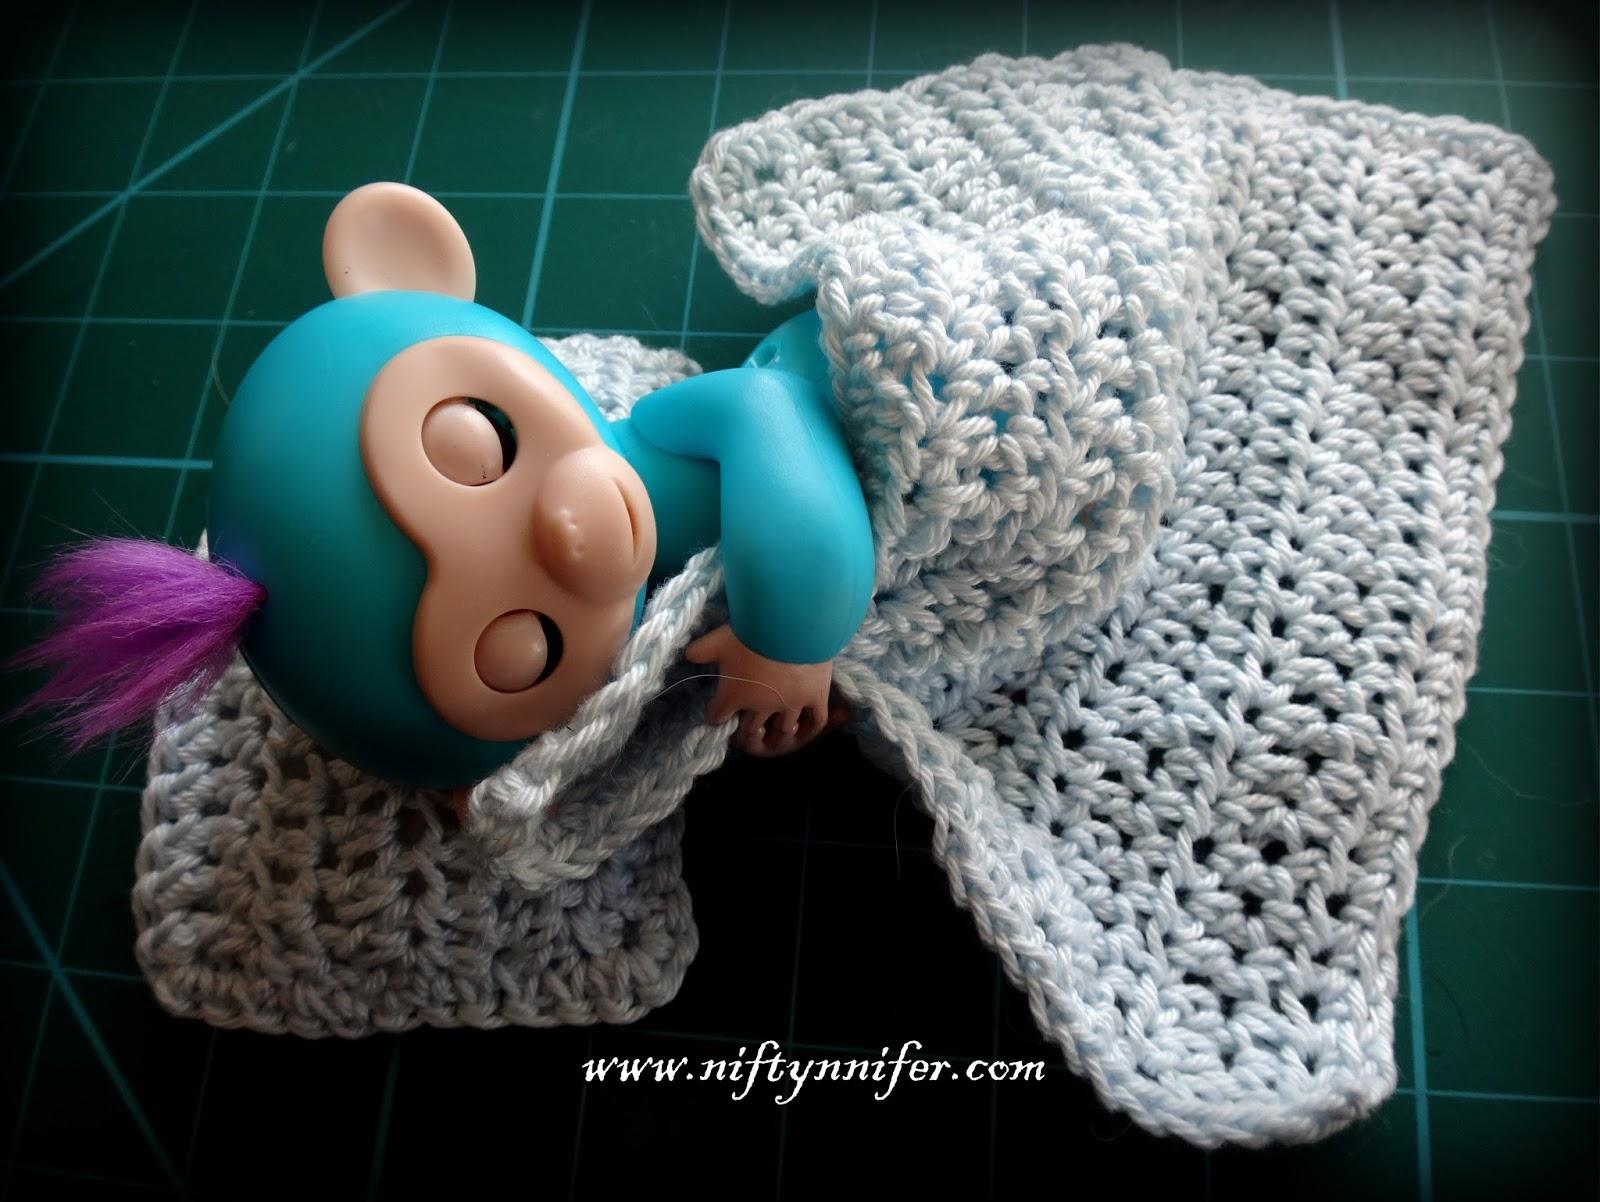 Niftynnifer\'s Crochet & Crafts